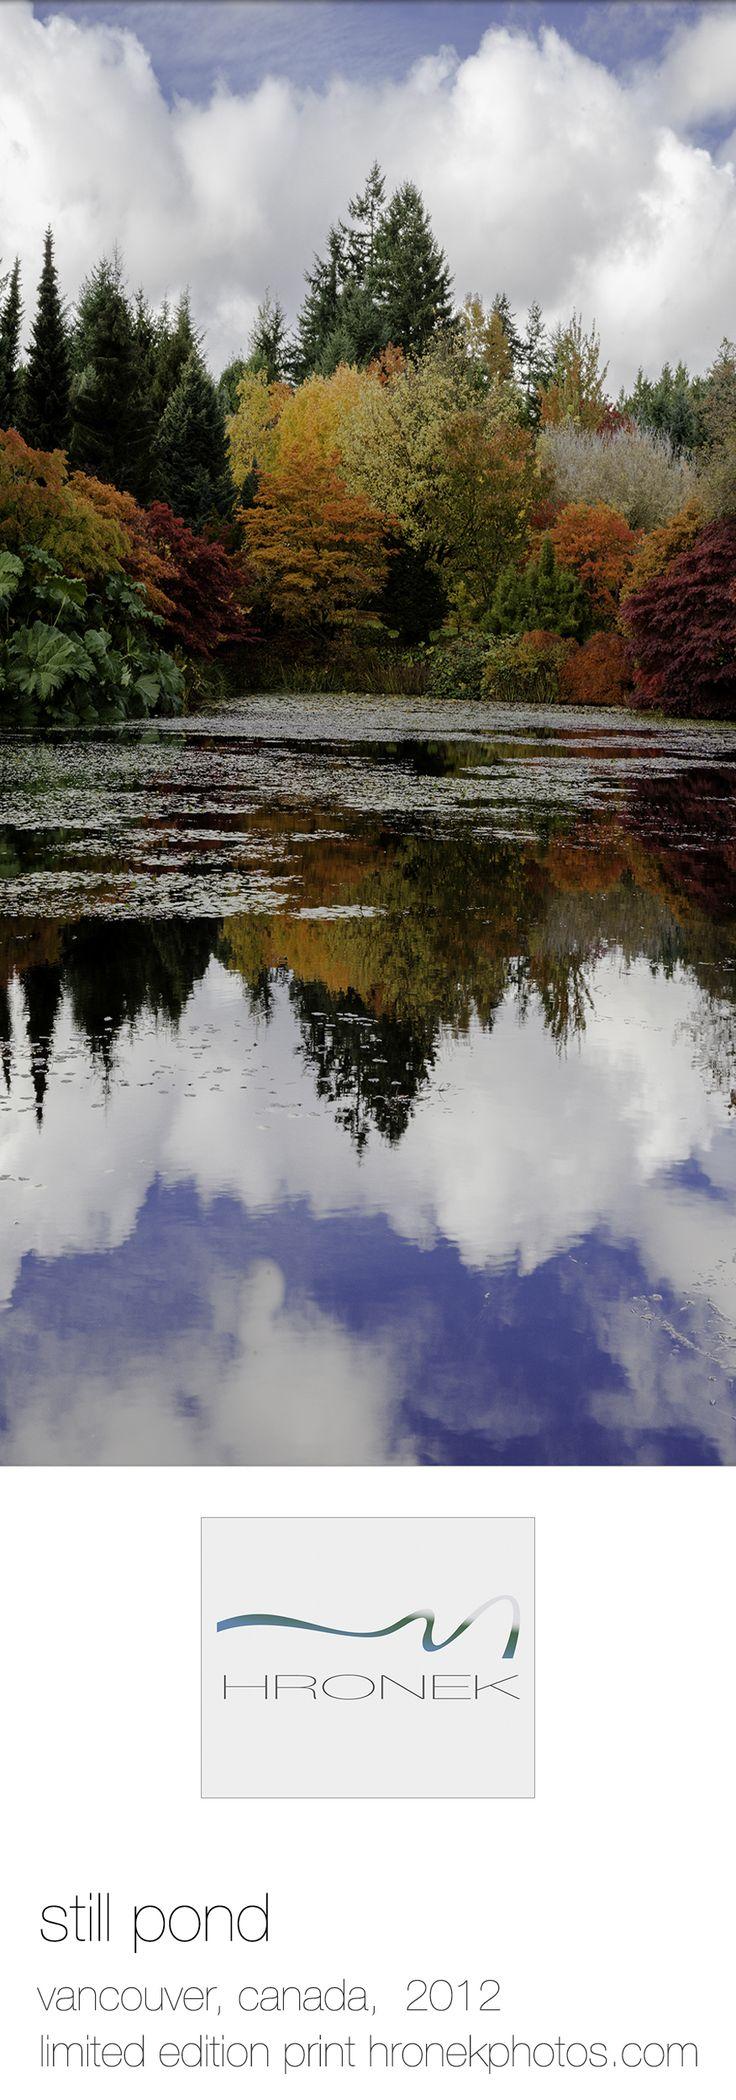 autumn tree mirroring in a park lake; queen elizabeth park, vancouver, canada